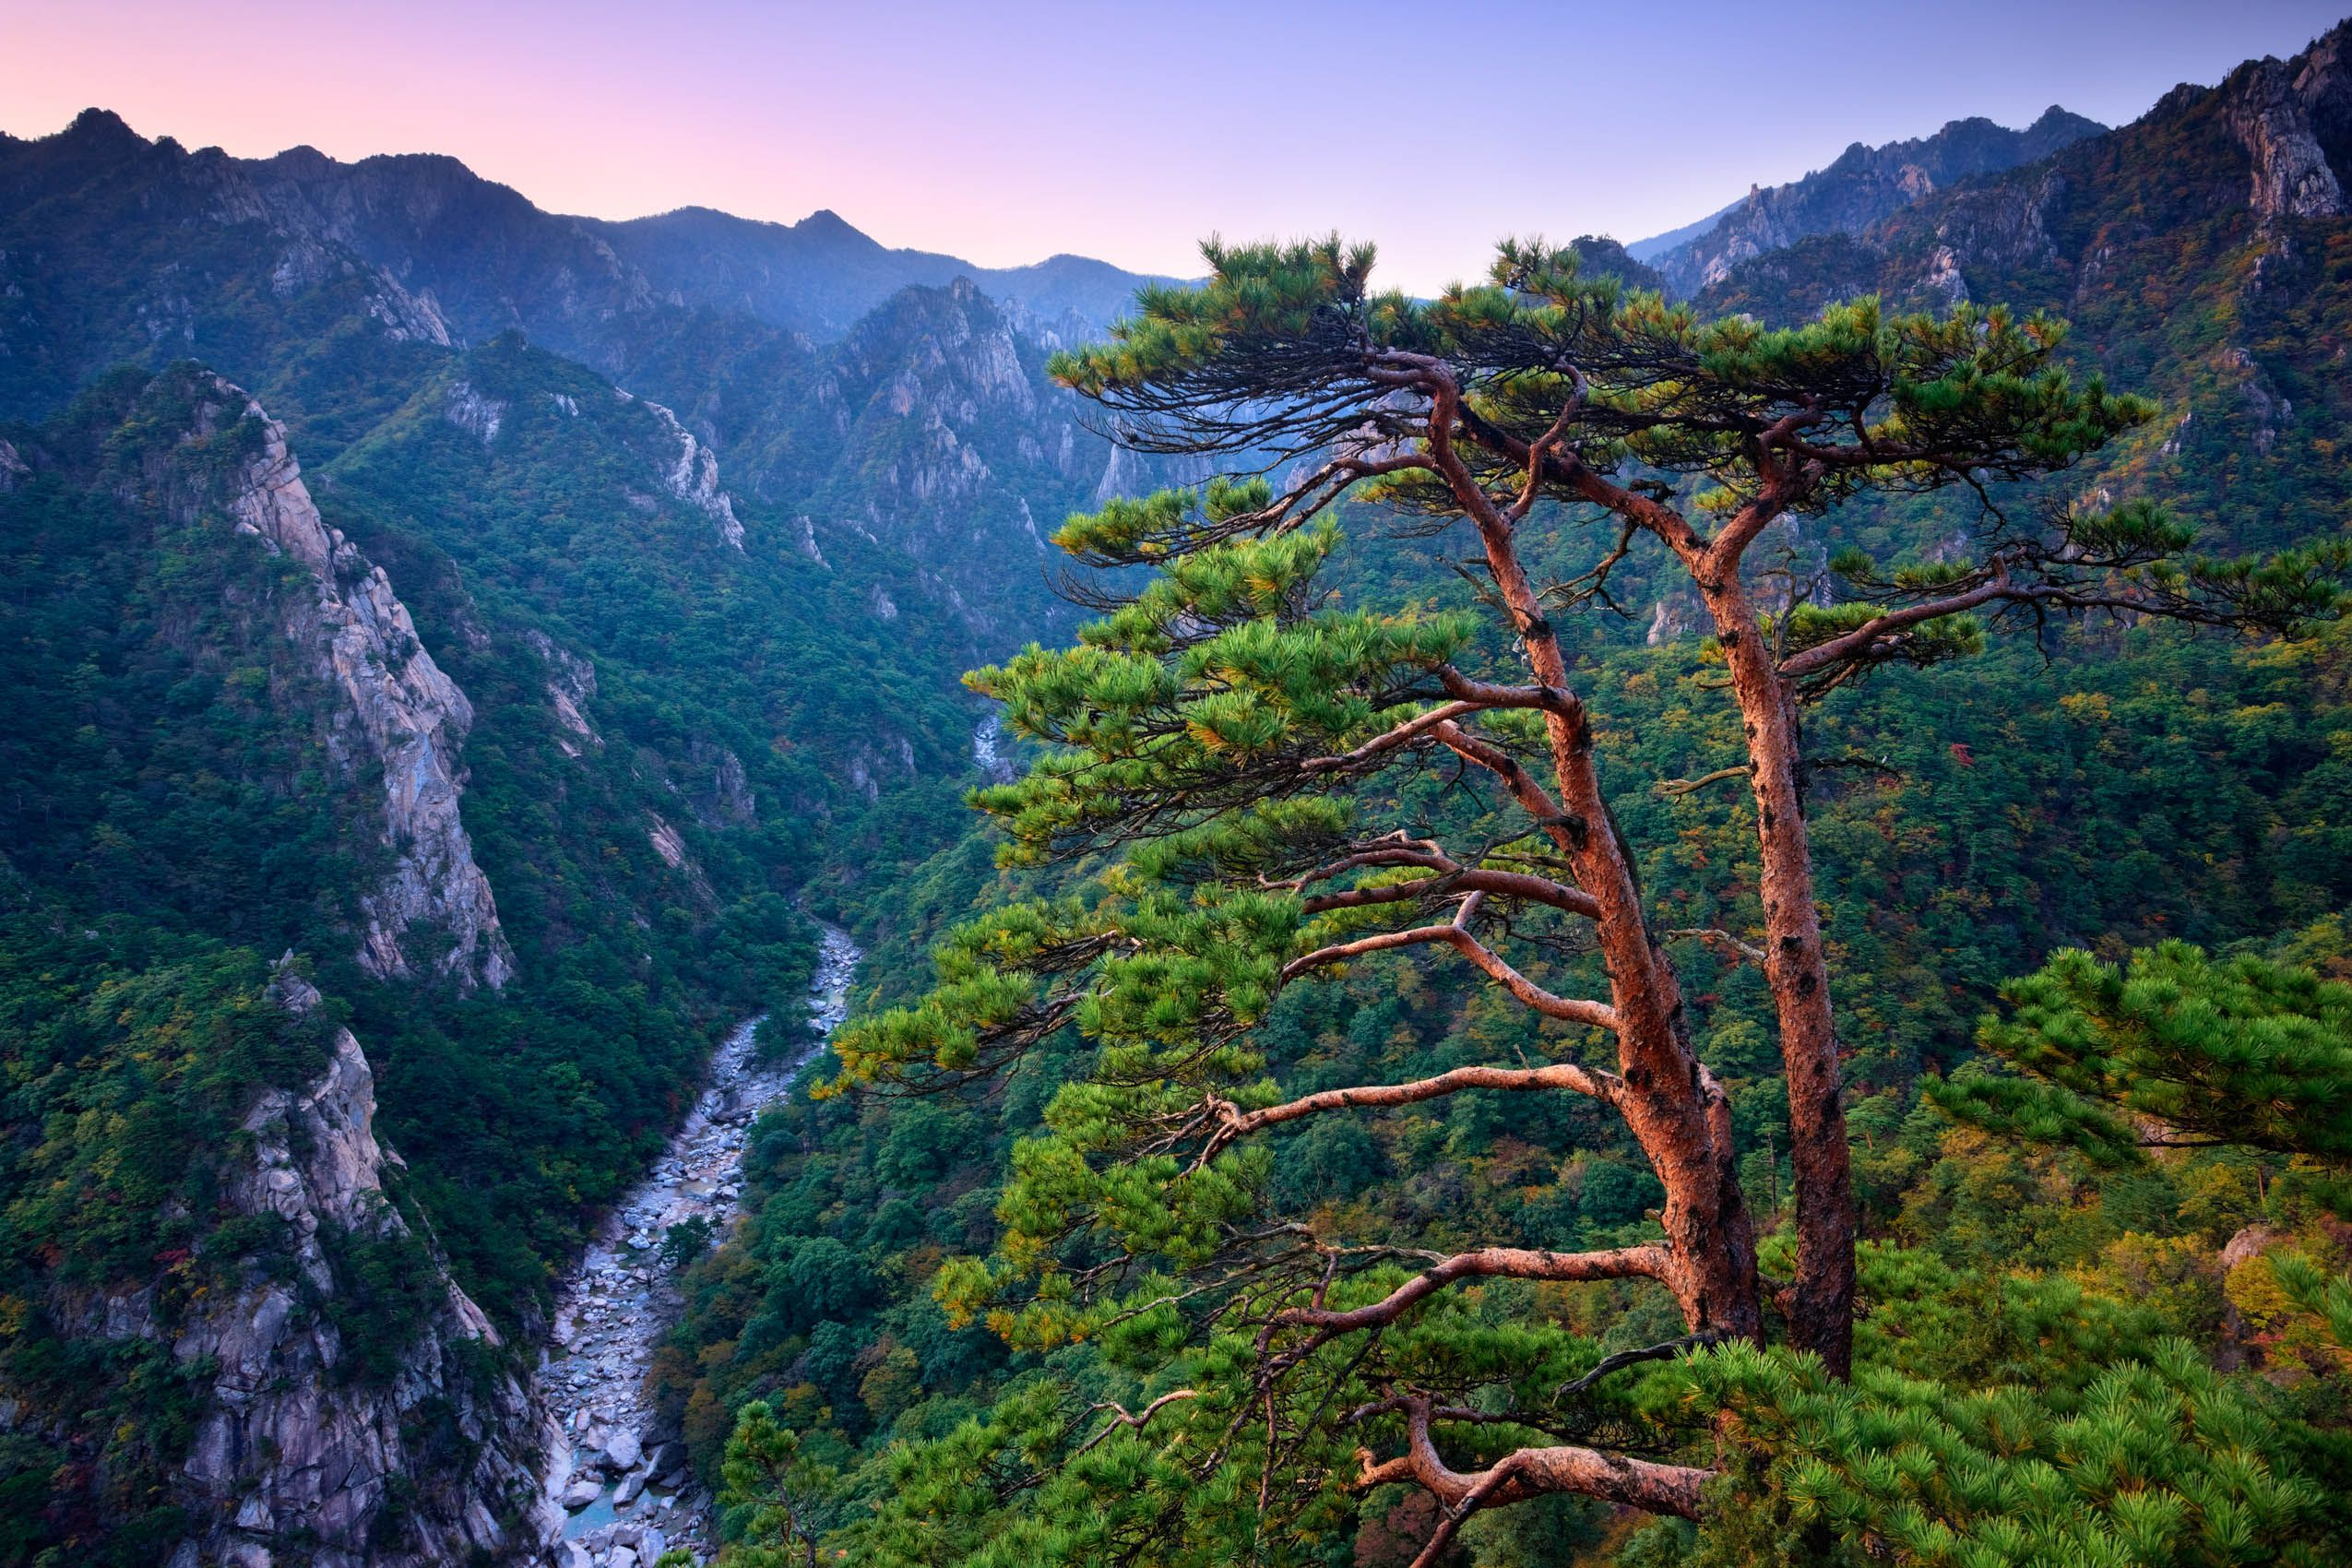 Above BiSeonDae